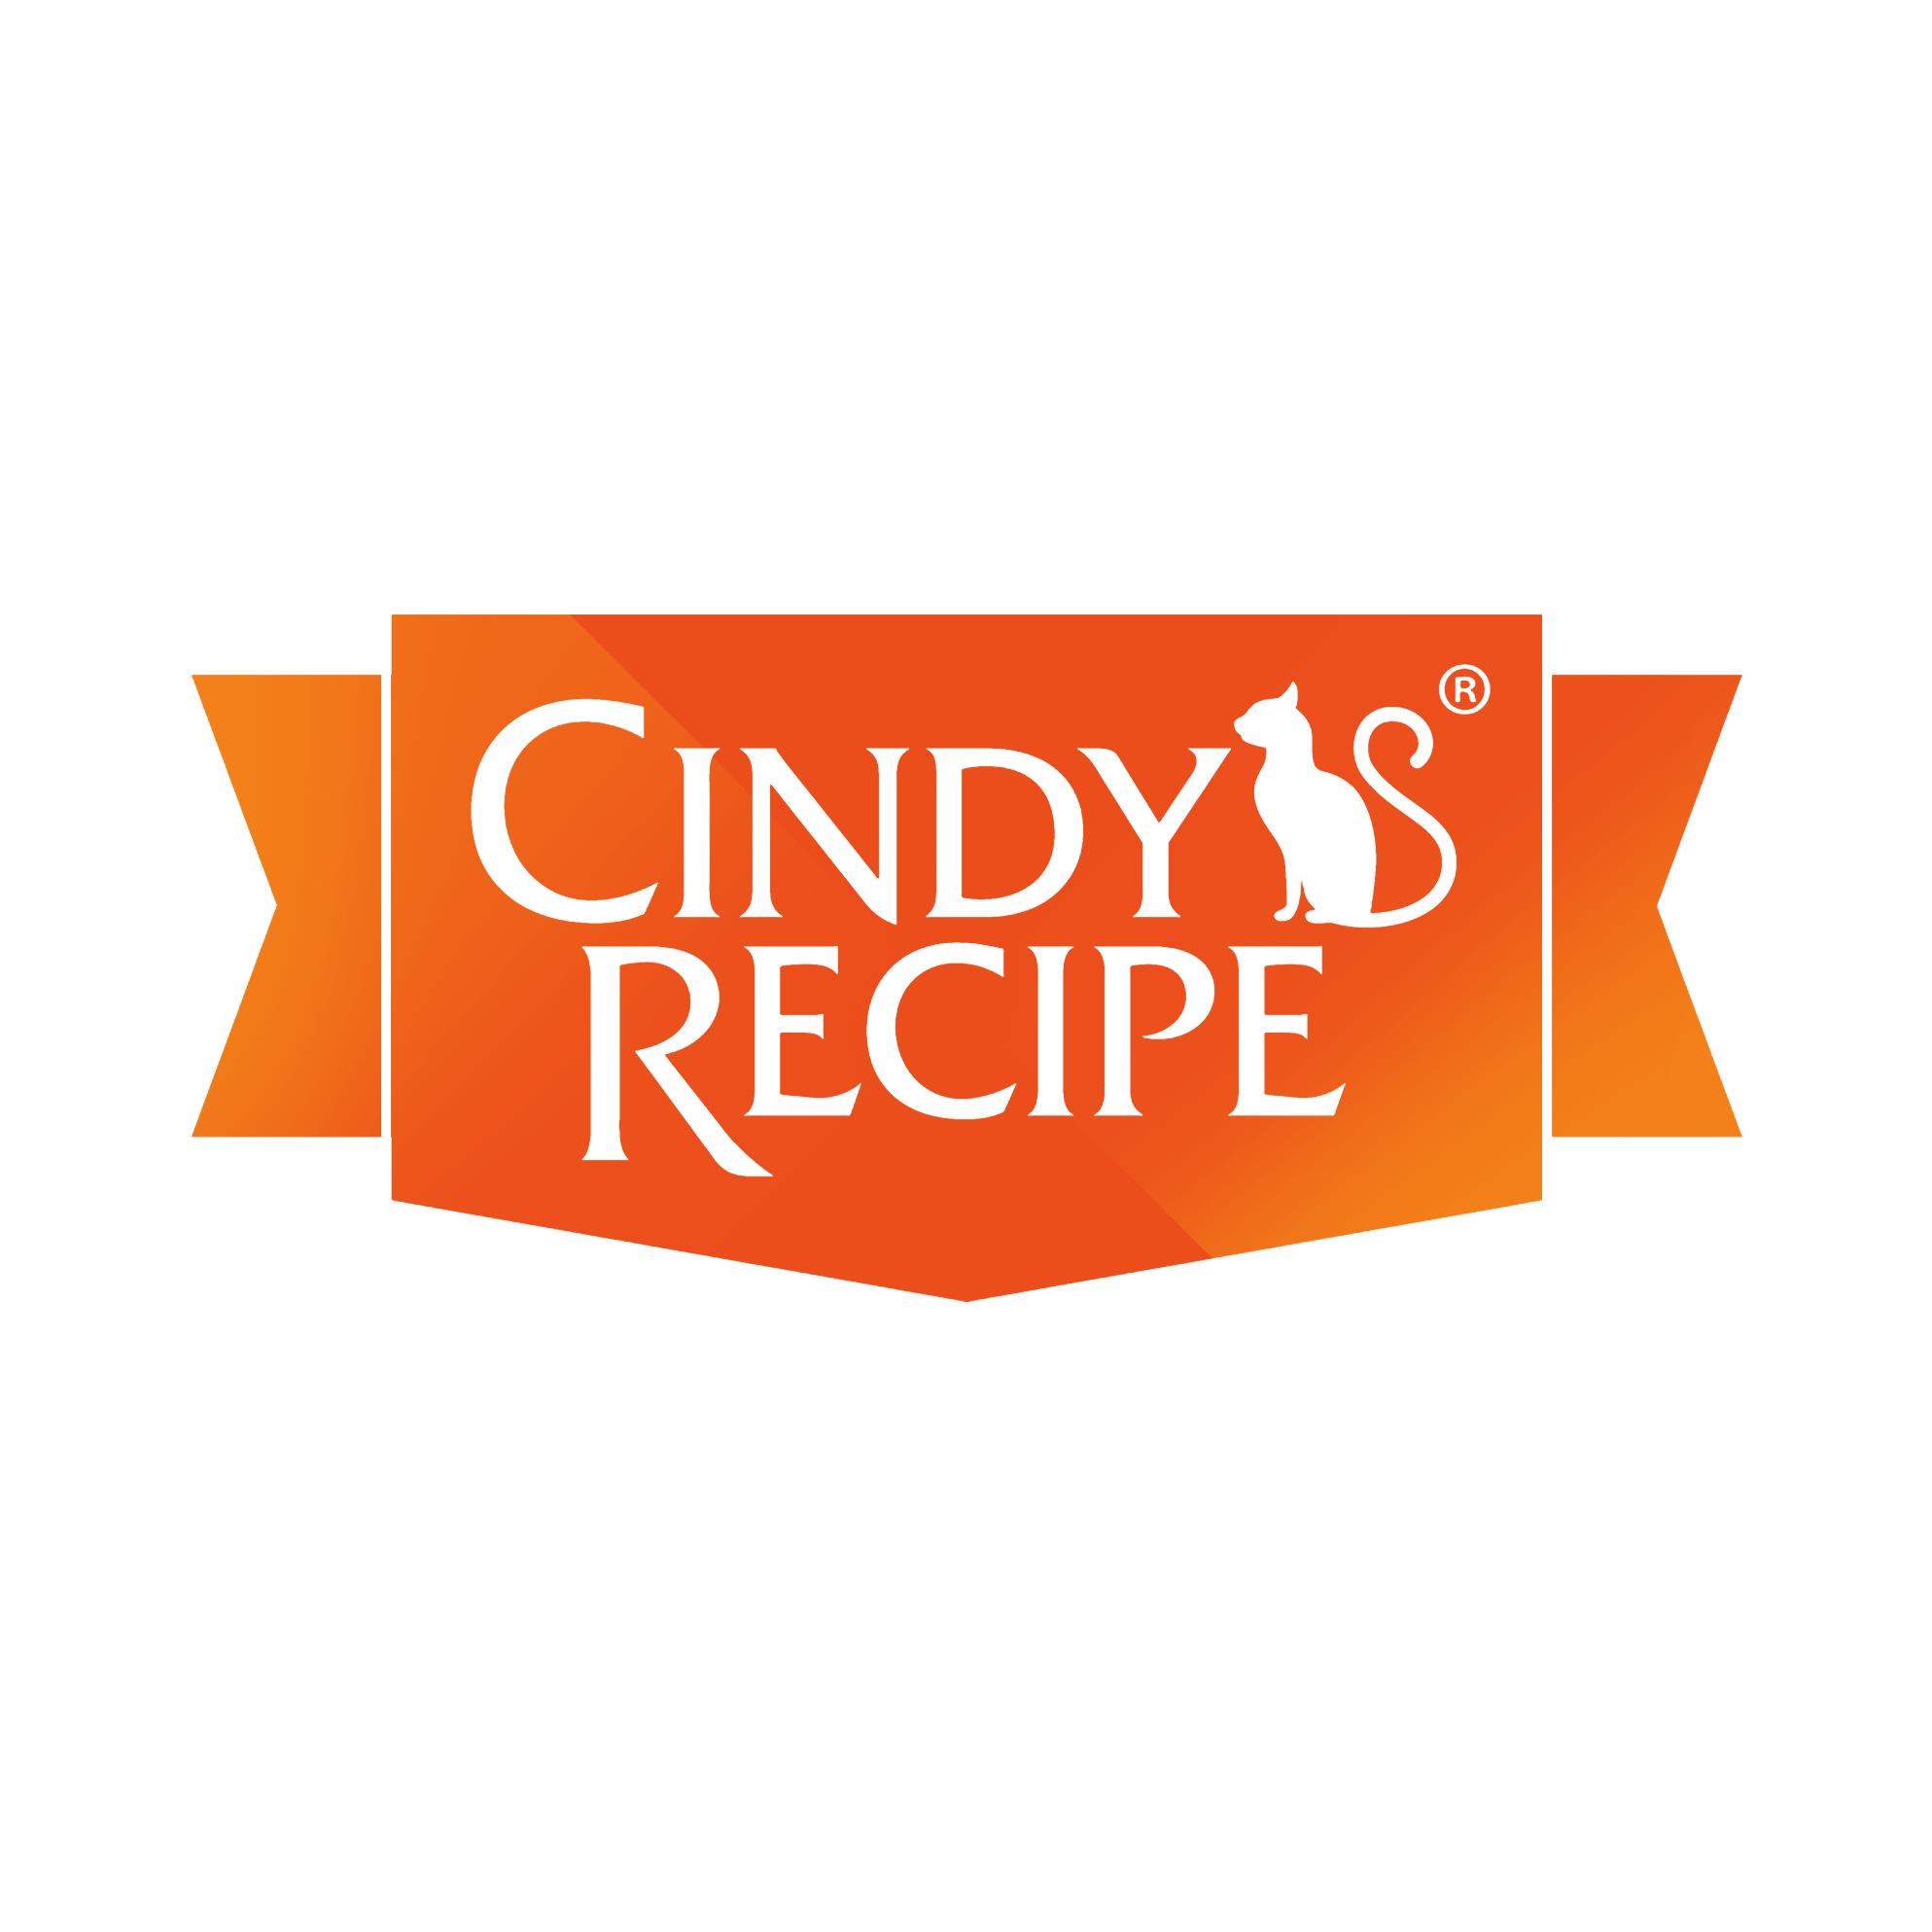 Cindy's Recipe